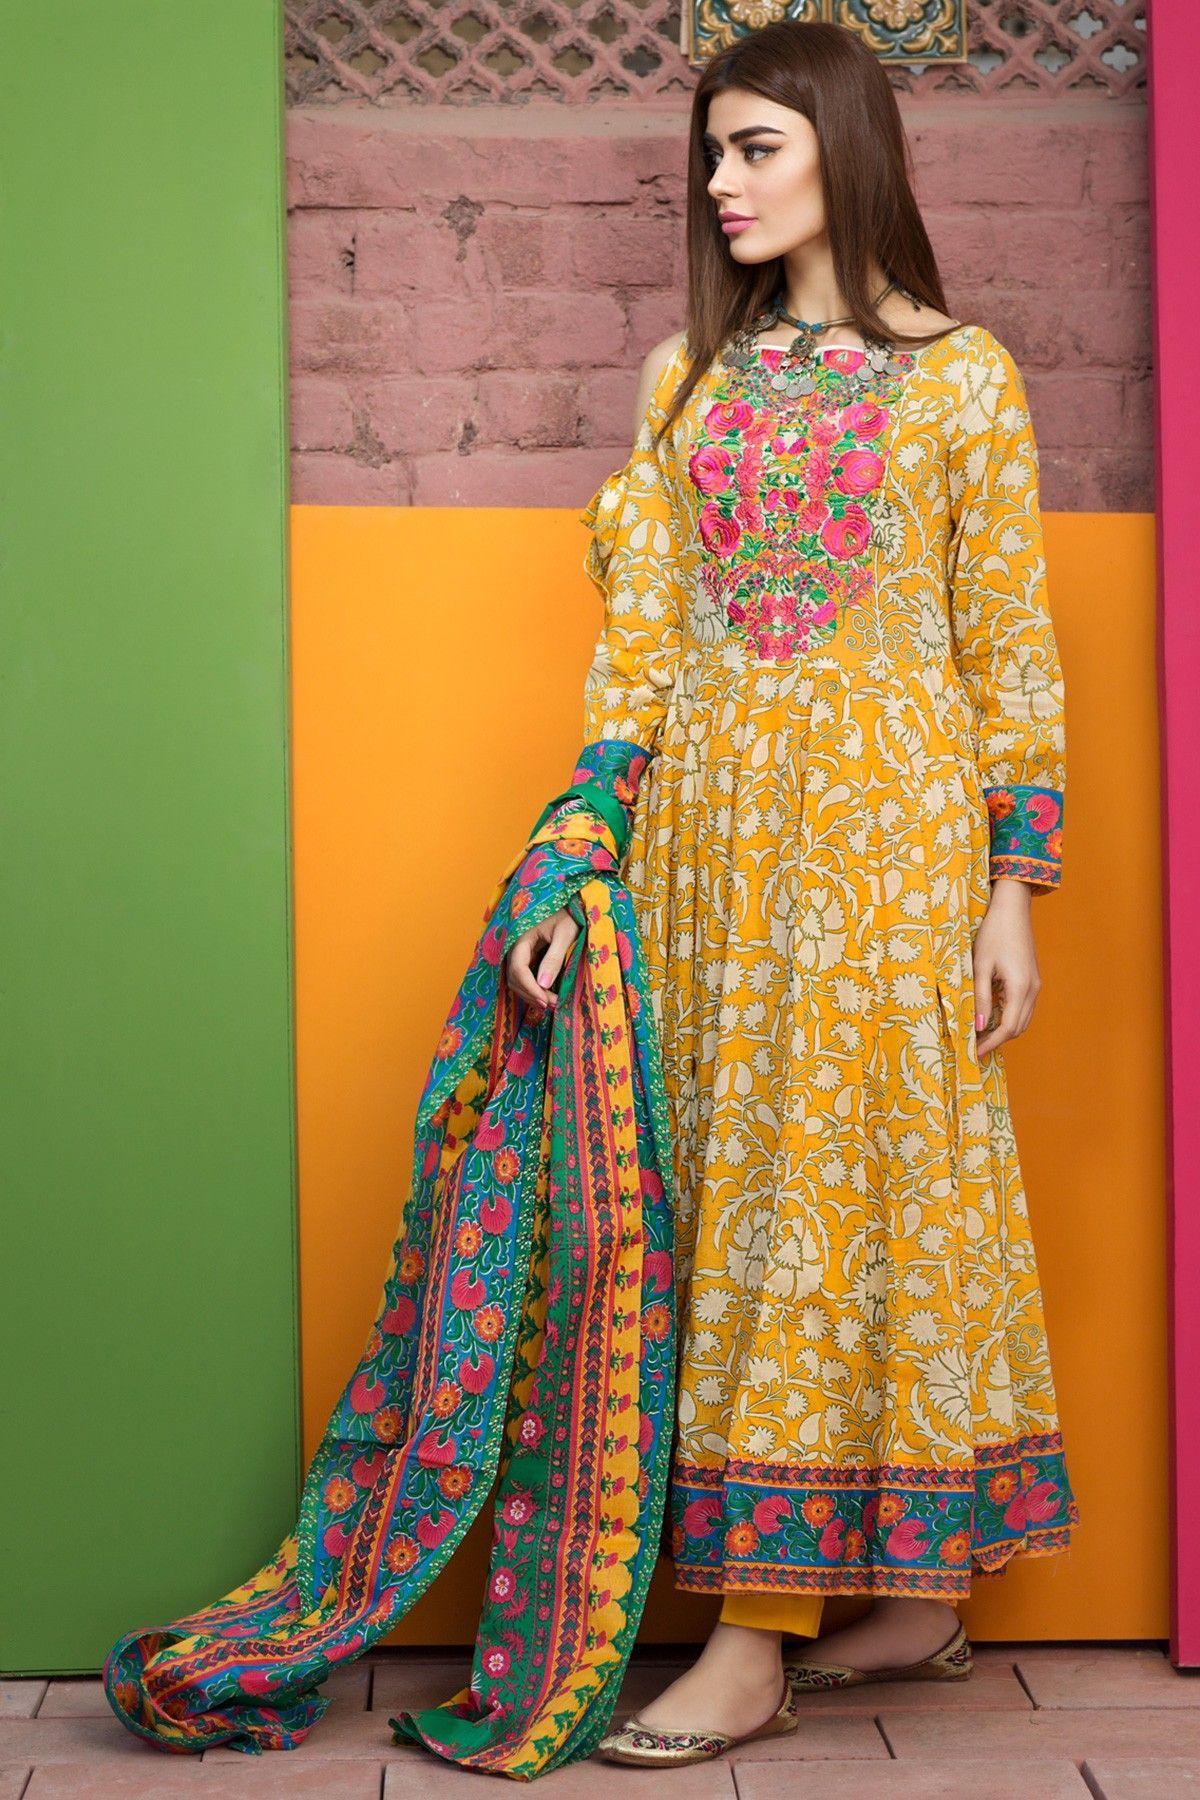 Khaadi Latest Dresses Online